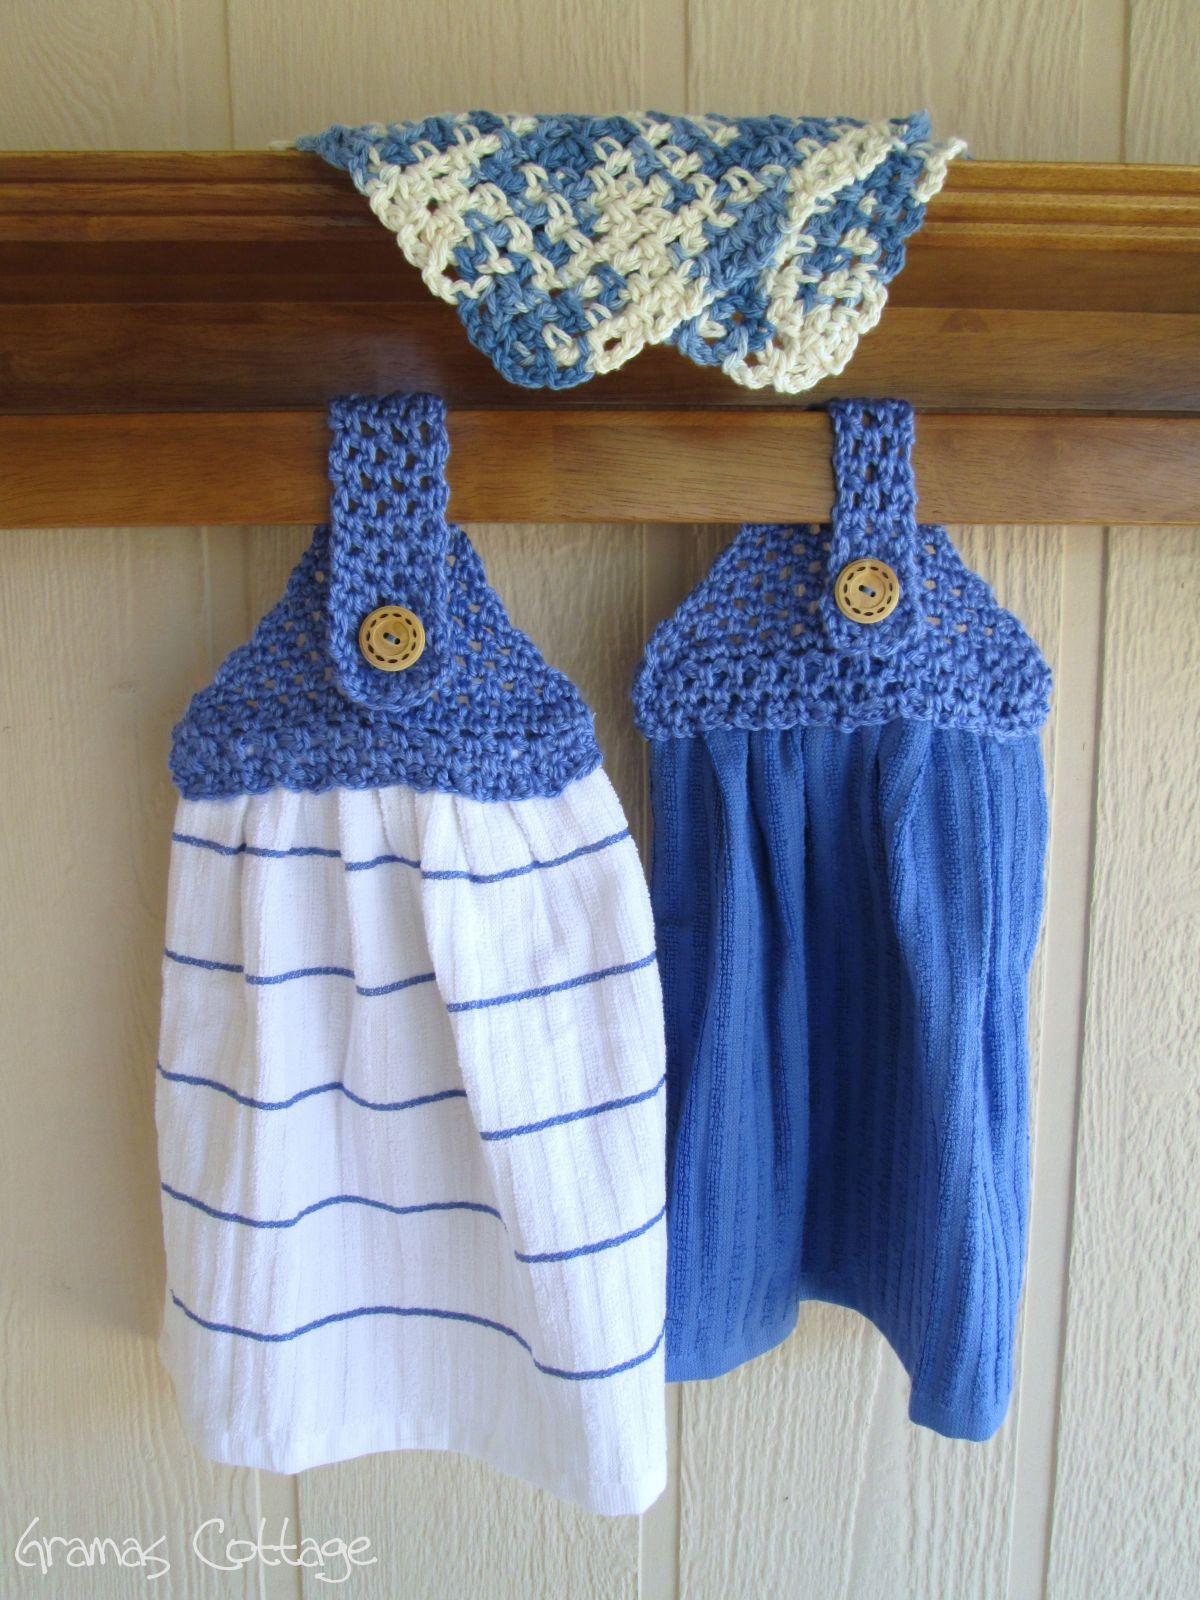 Crochet Patterns Kitchen Hand Towels : Hand Crochet Kitchen Towels Crochet Pinterest